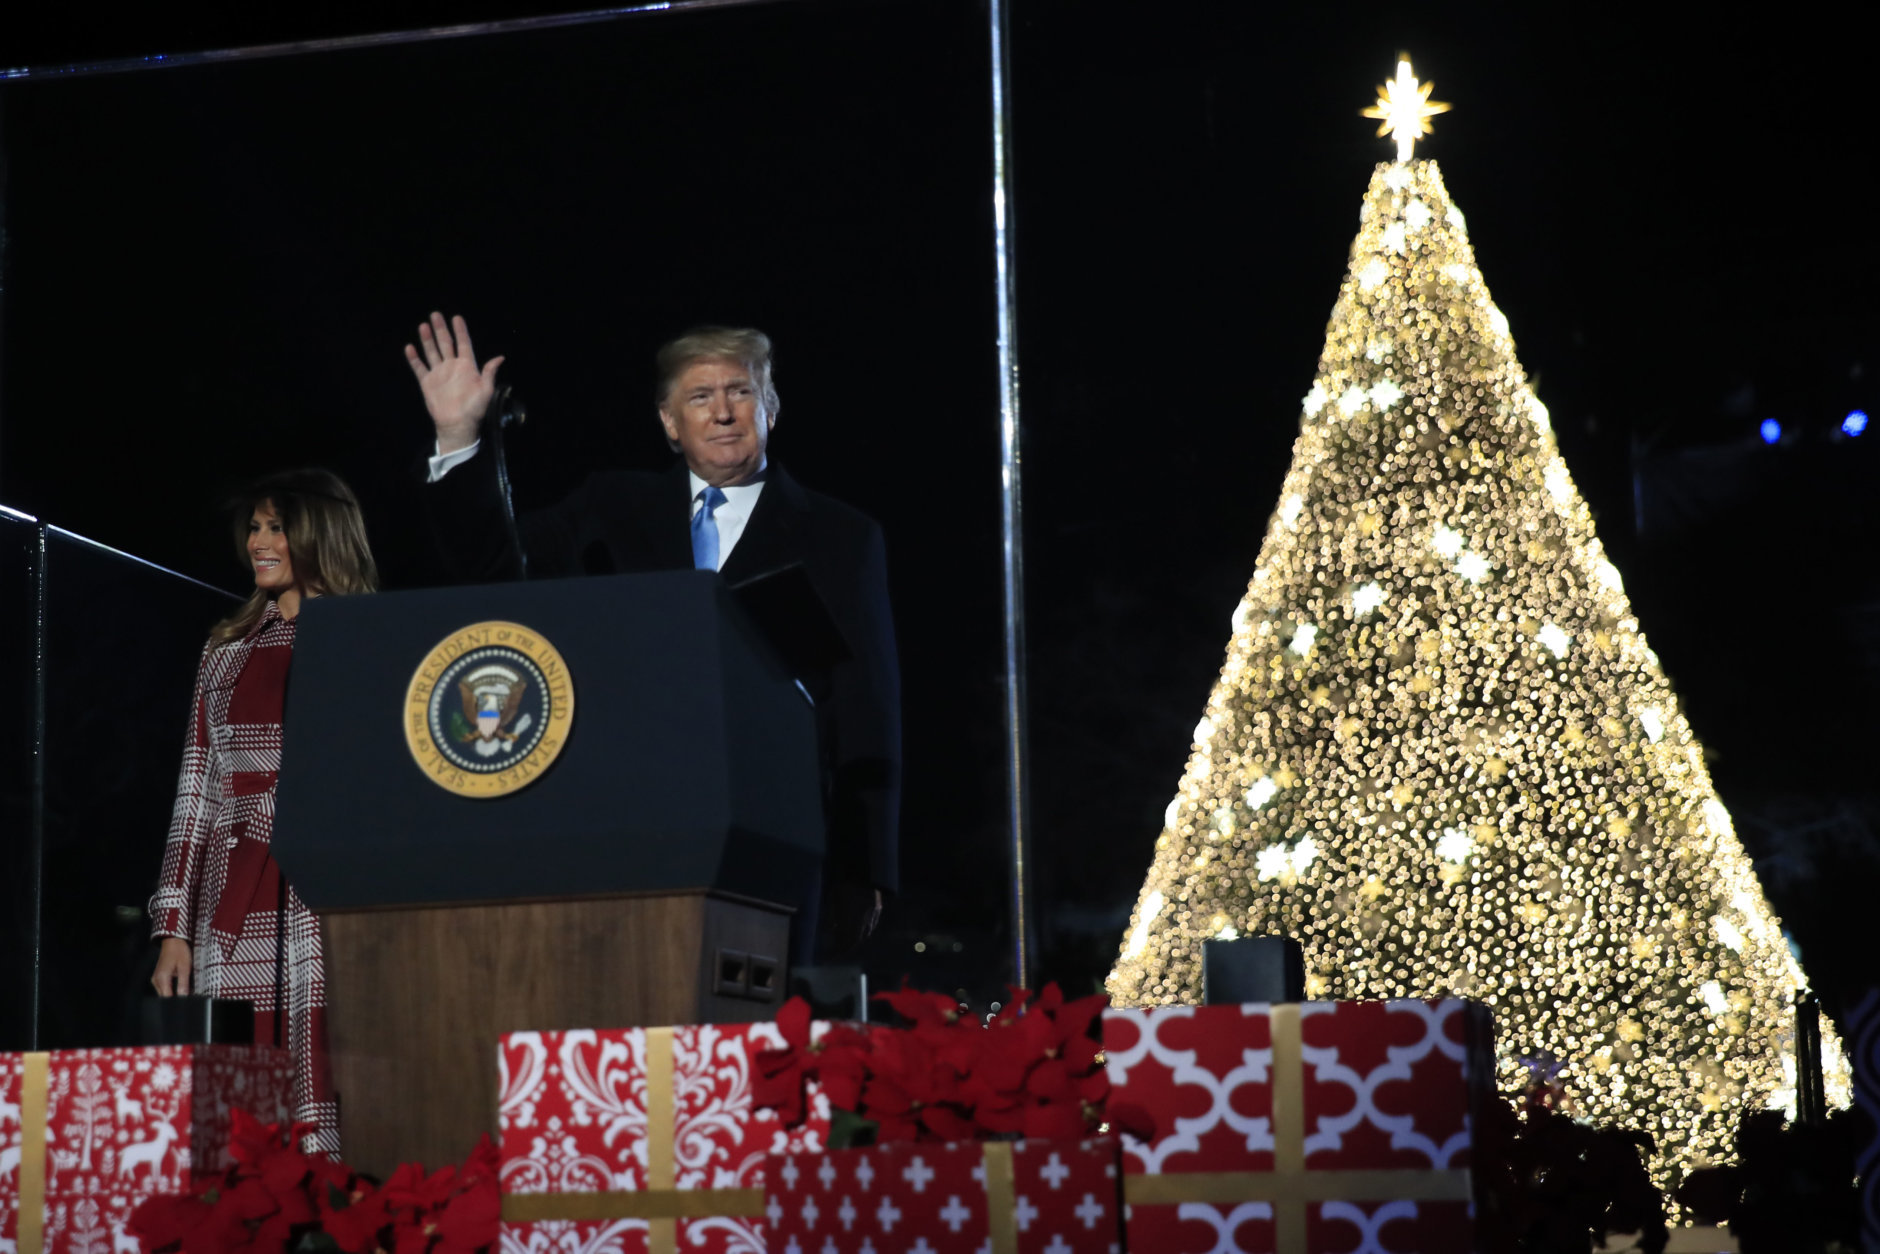 Donald Trump Christmas Tree Lighting Ceremony 2020 Trump lights National Christmas Tree in holiday tradition | WTOP